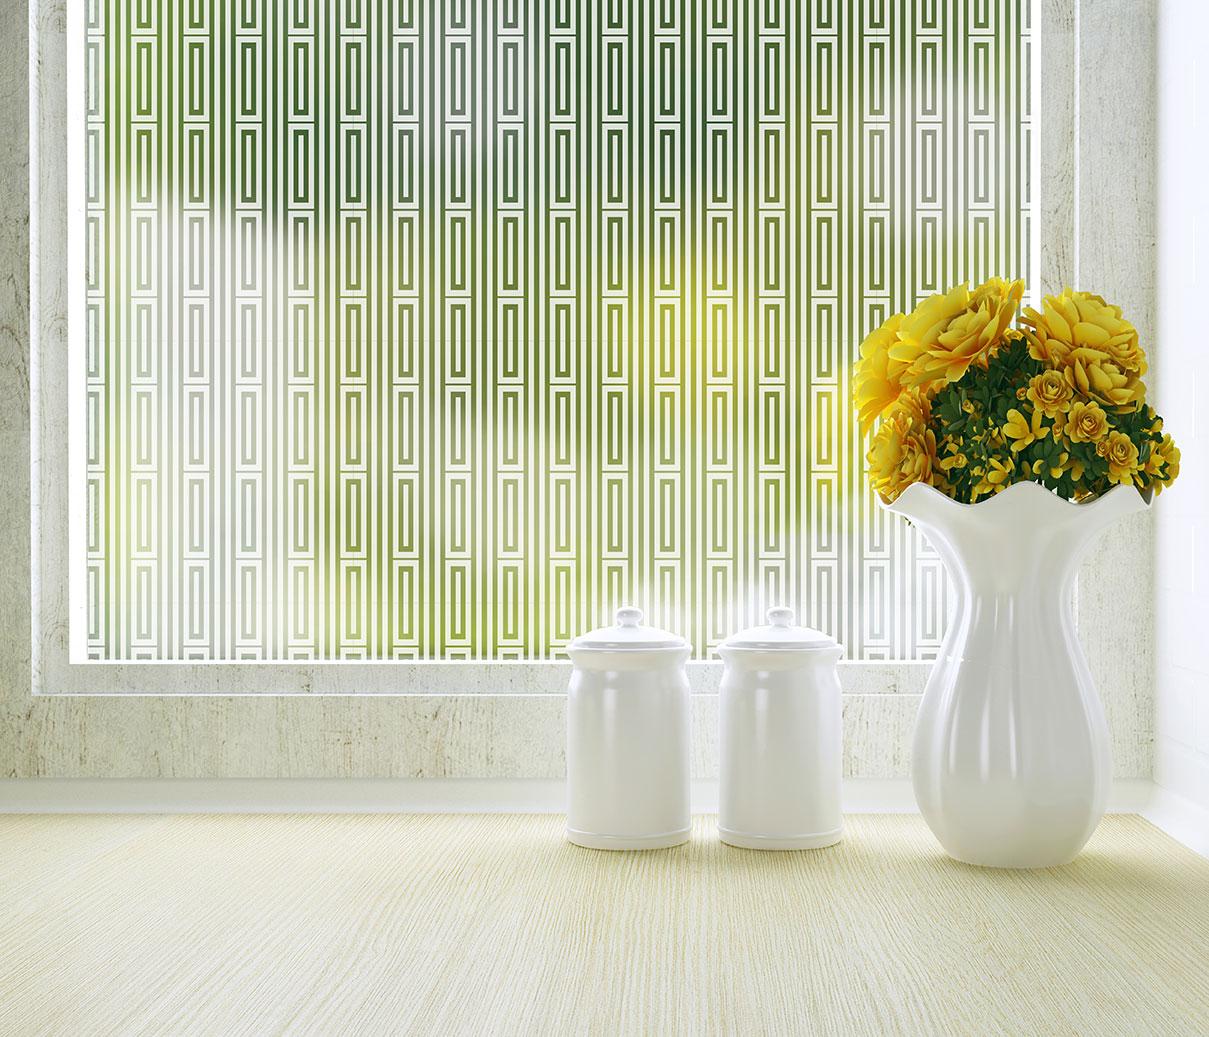 Do It Yourself Home Design: Modern Window Film & Decorative Film For